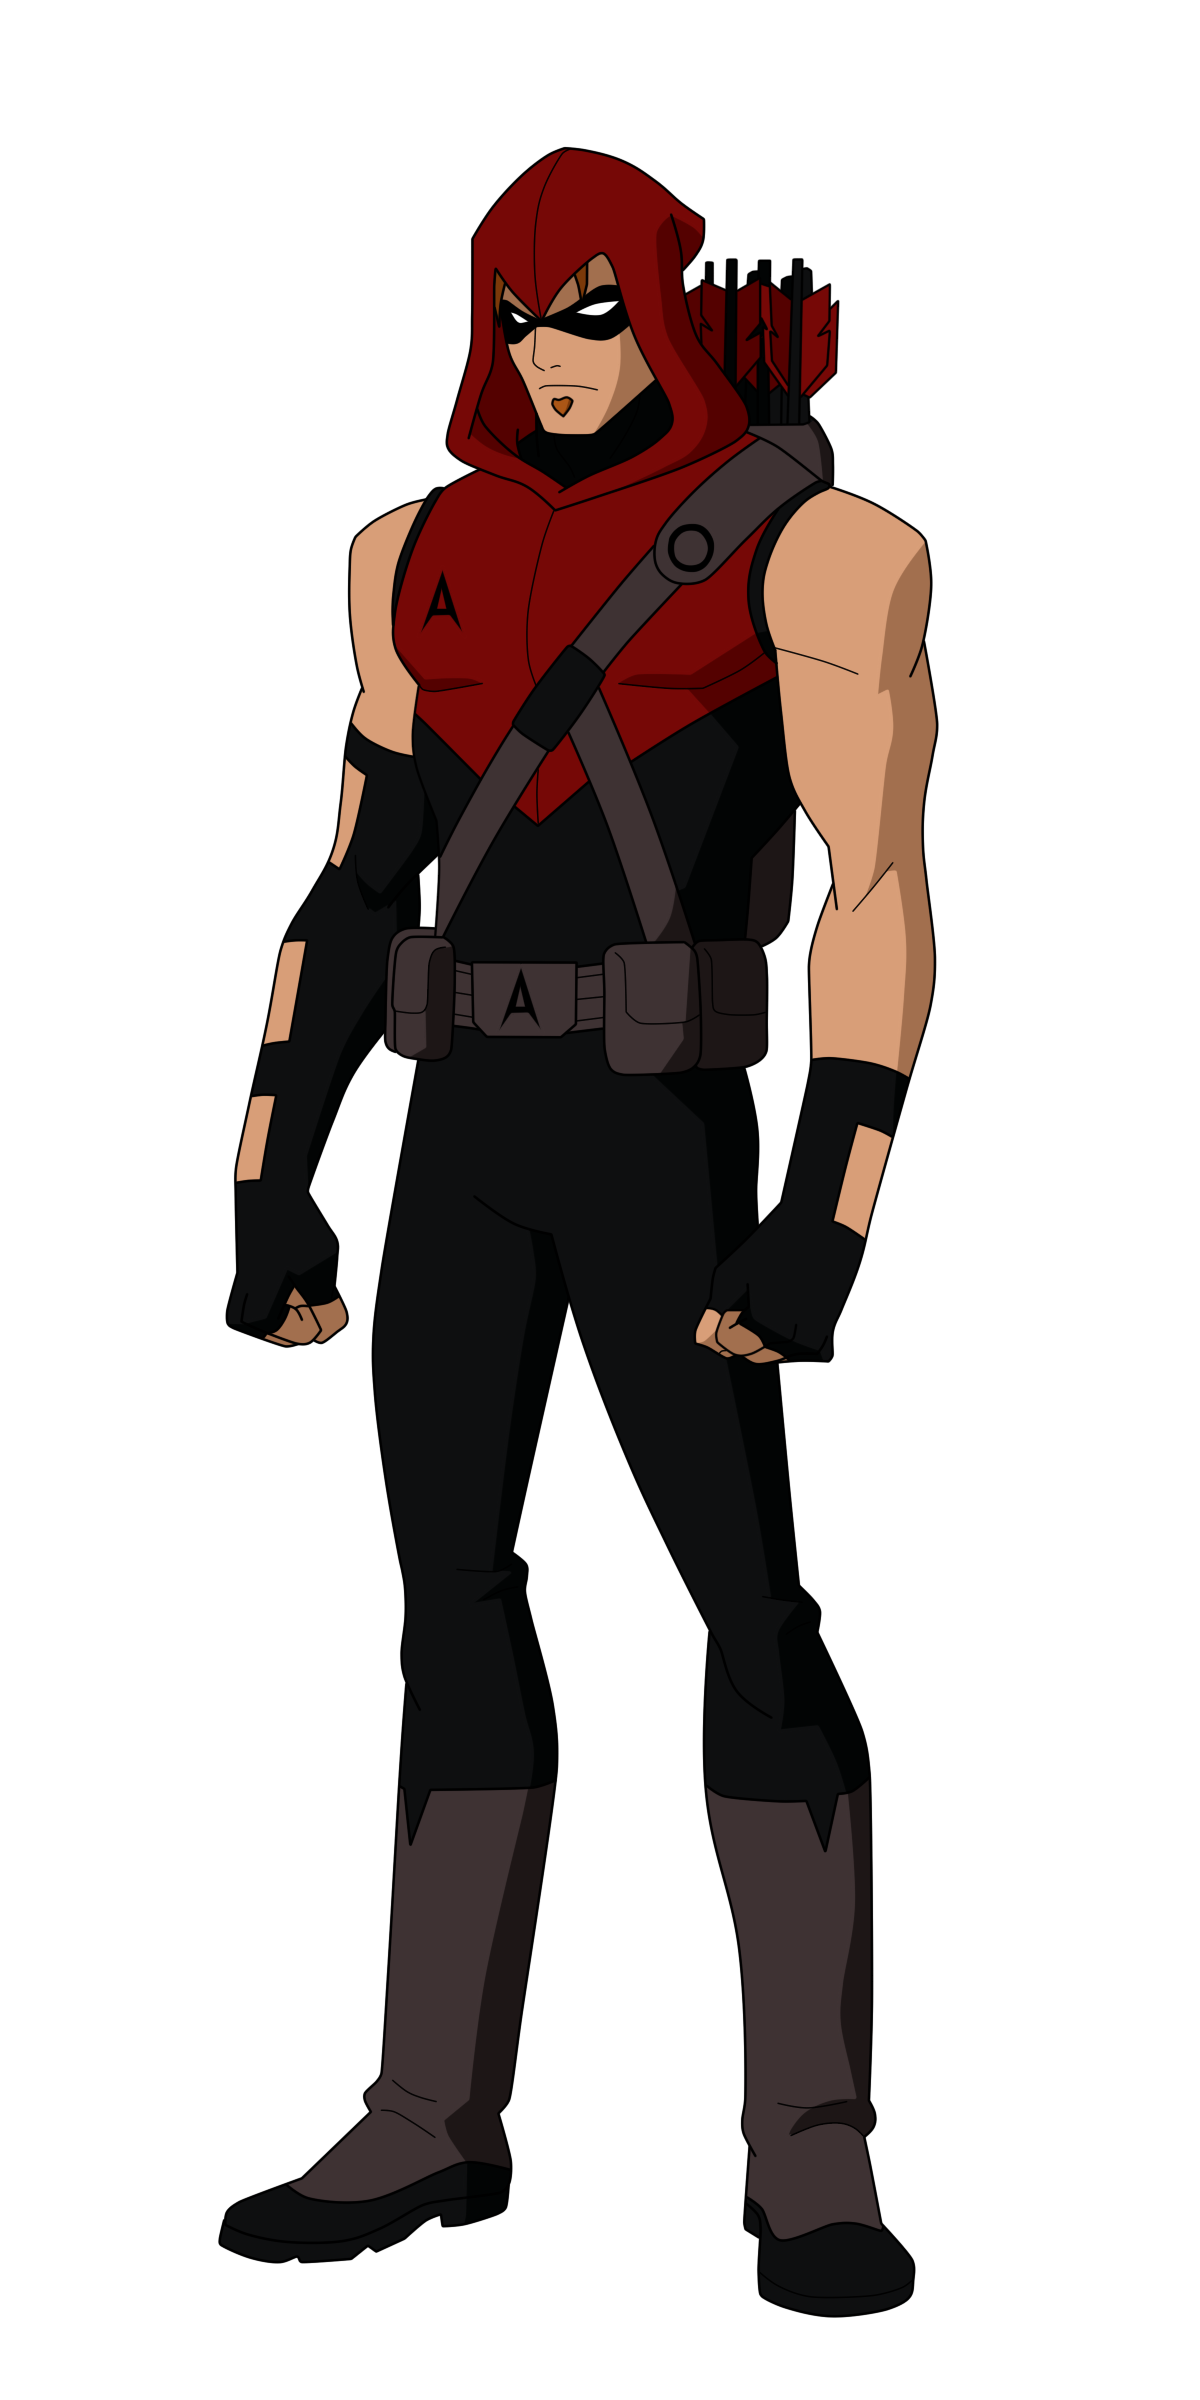 Red Arrow Titans Design by Bobkitty23 on DeviantArt